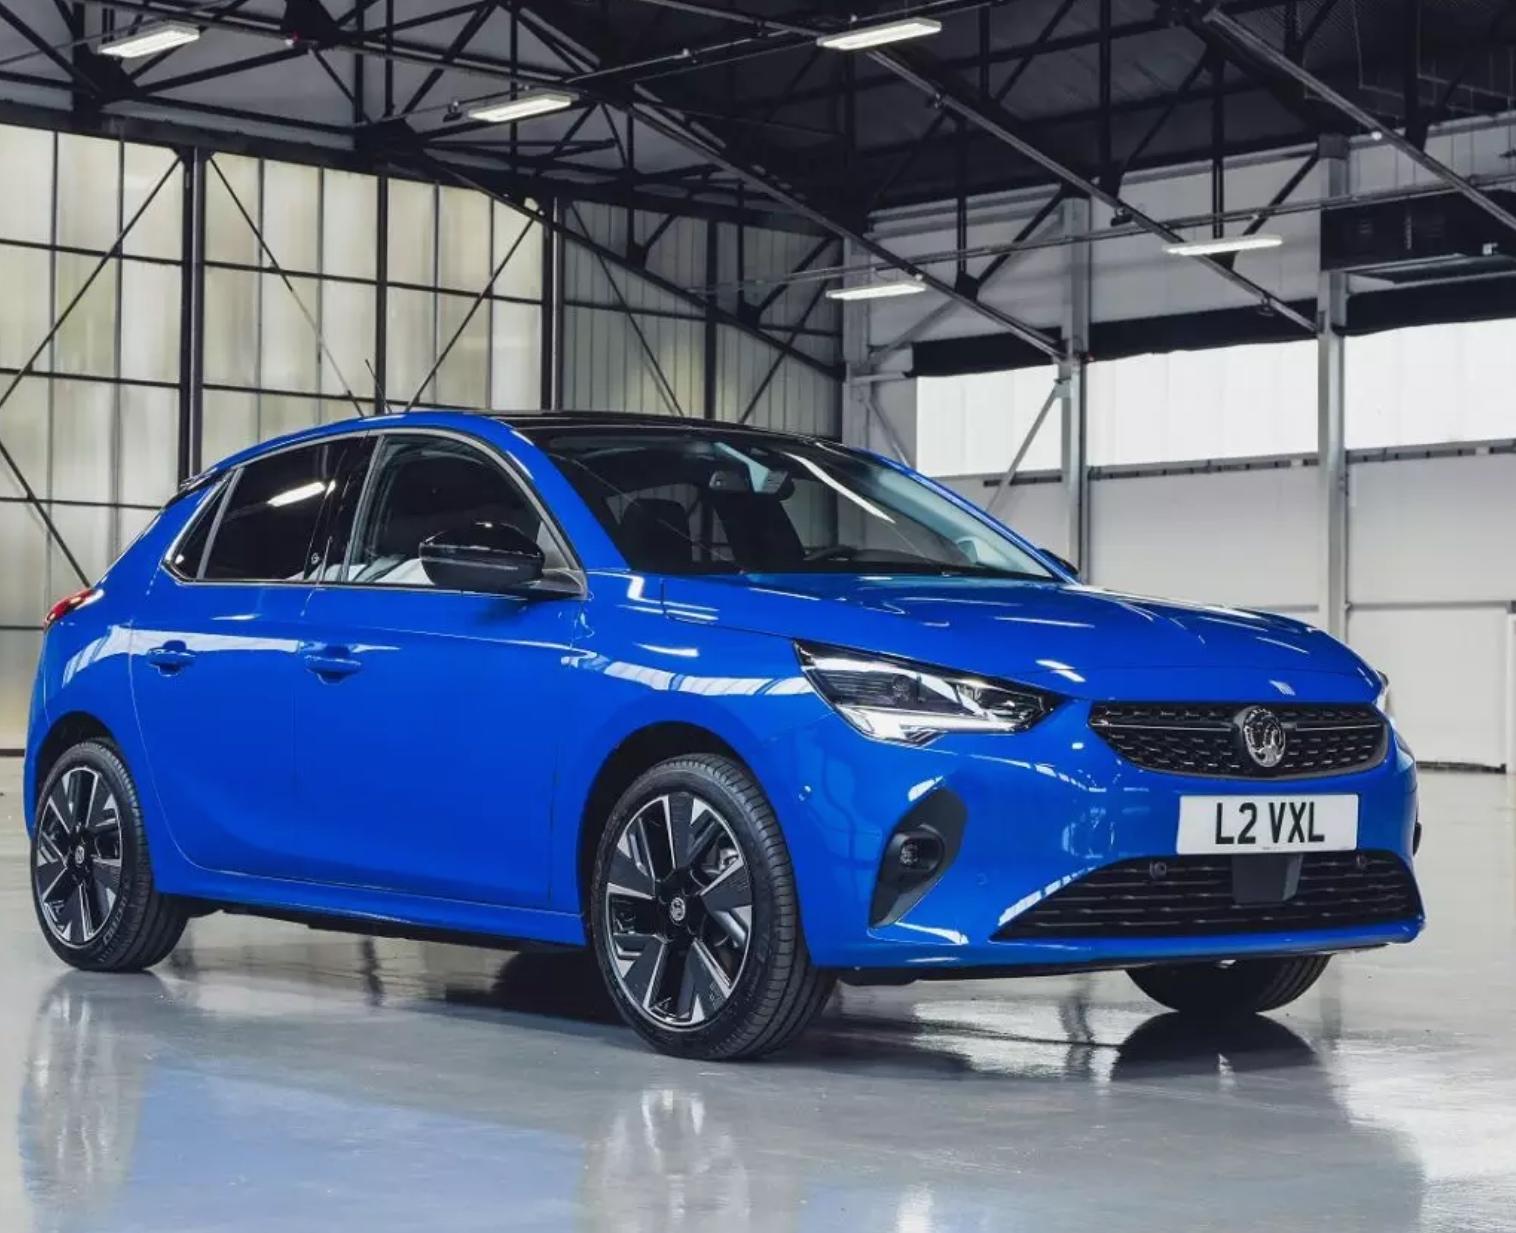 24 month Lease (1+23) - Vauxhall Corsa E Electric Hatchback 100kW Elite Nav - 10k miles p/a - £251pm + £198 admin = £6219 @ Express Vehicle